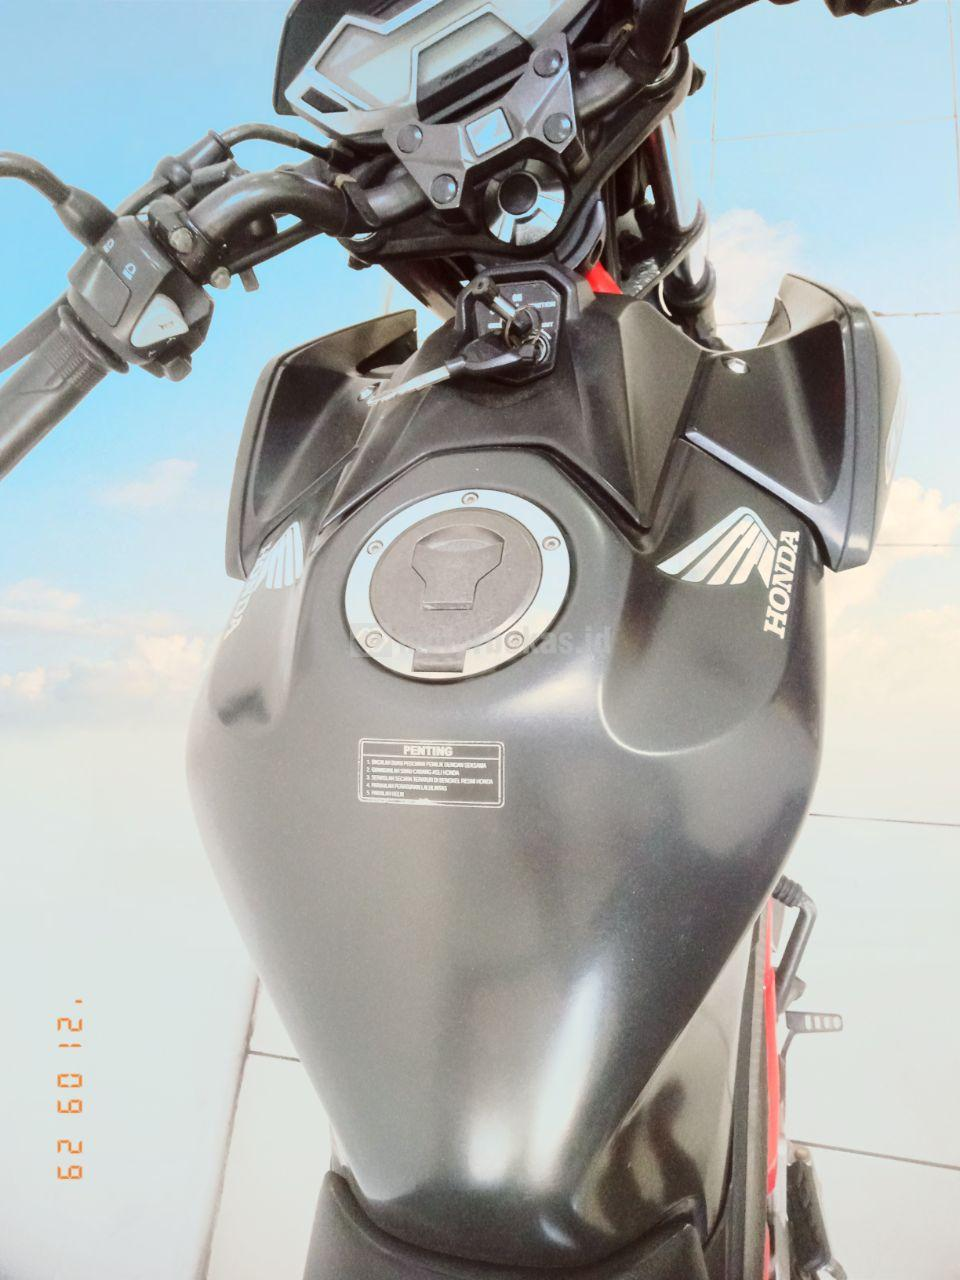 HONDA CB 150R FI 2016 motorbekas.id